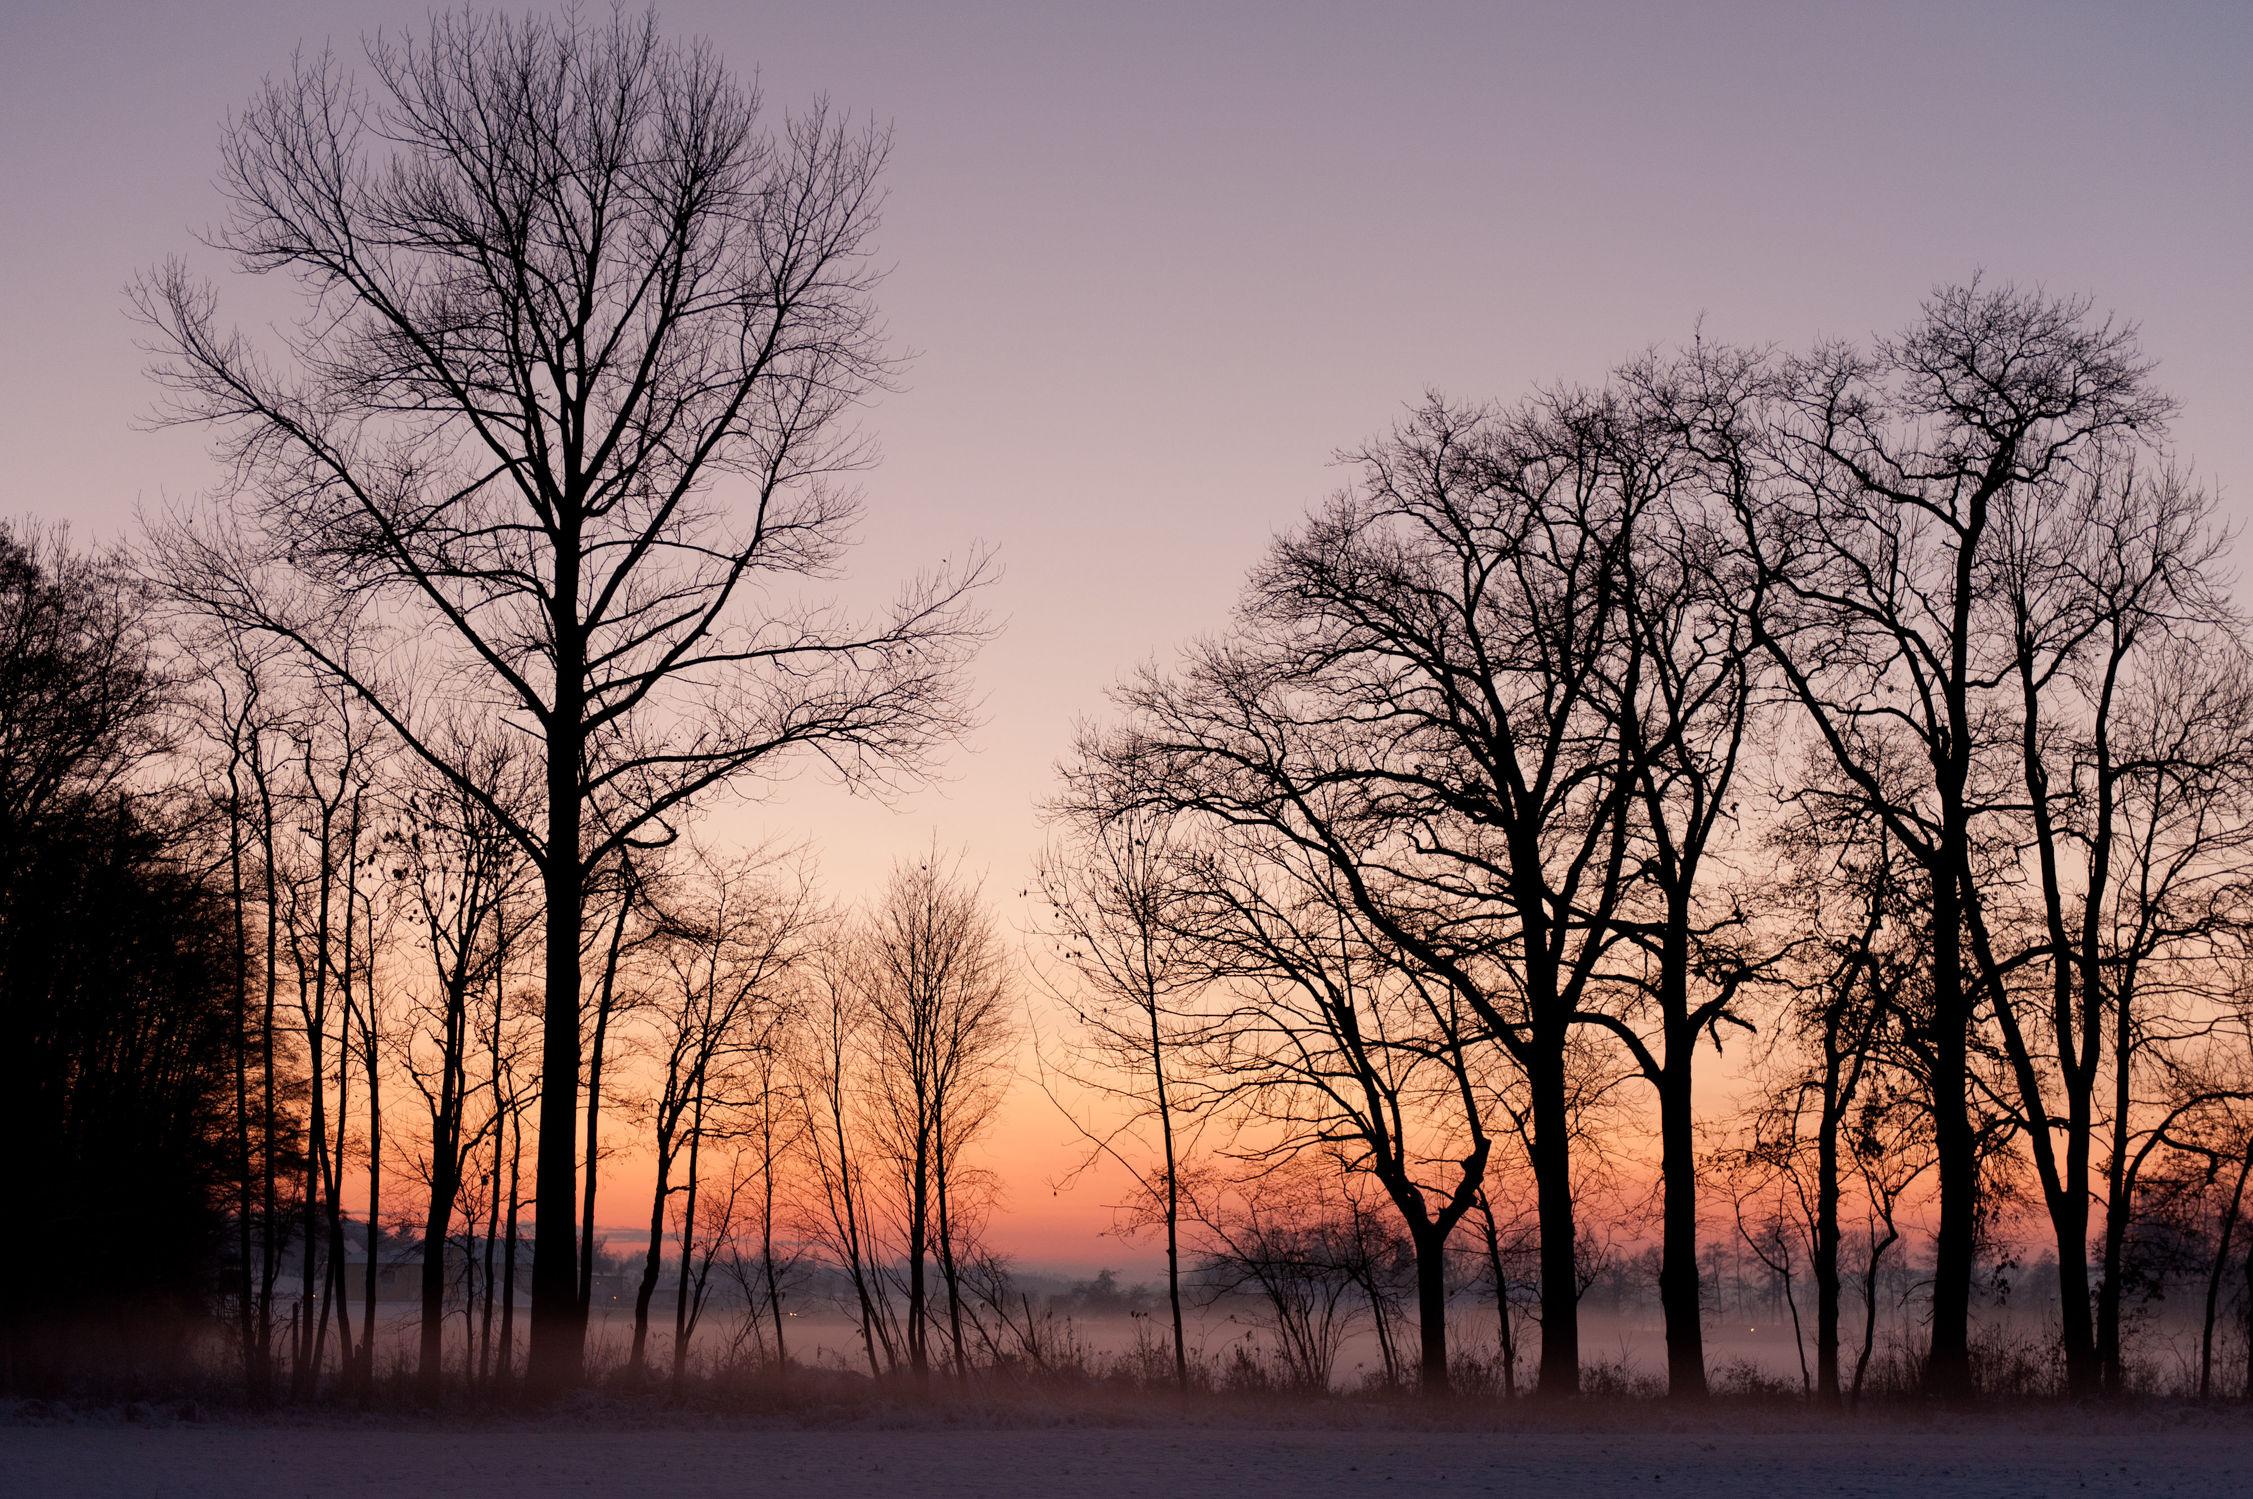 Bild mit Landschaften, Bäume, Winter, Schnee, Sonnenuntergang, Sport, Sonnenaufgang, Sonne, Wald, Baum, Landschaft, landscape, Kälte